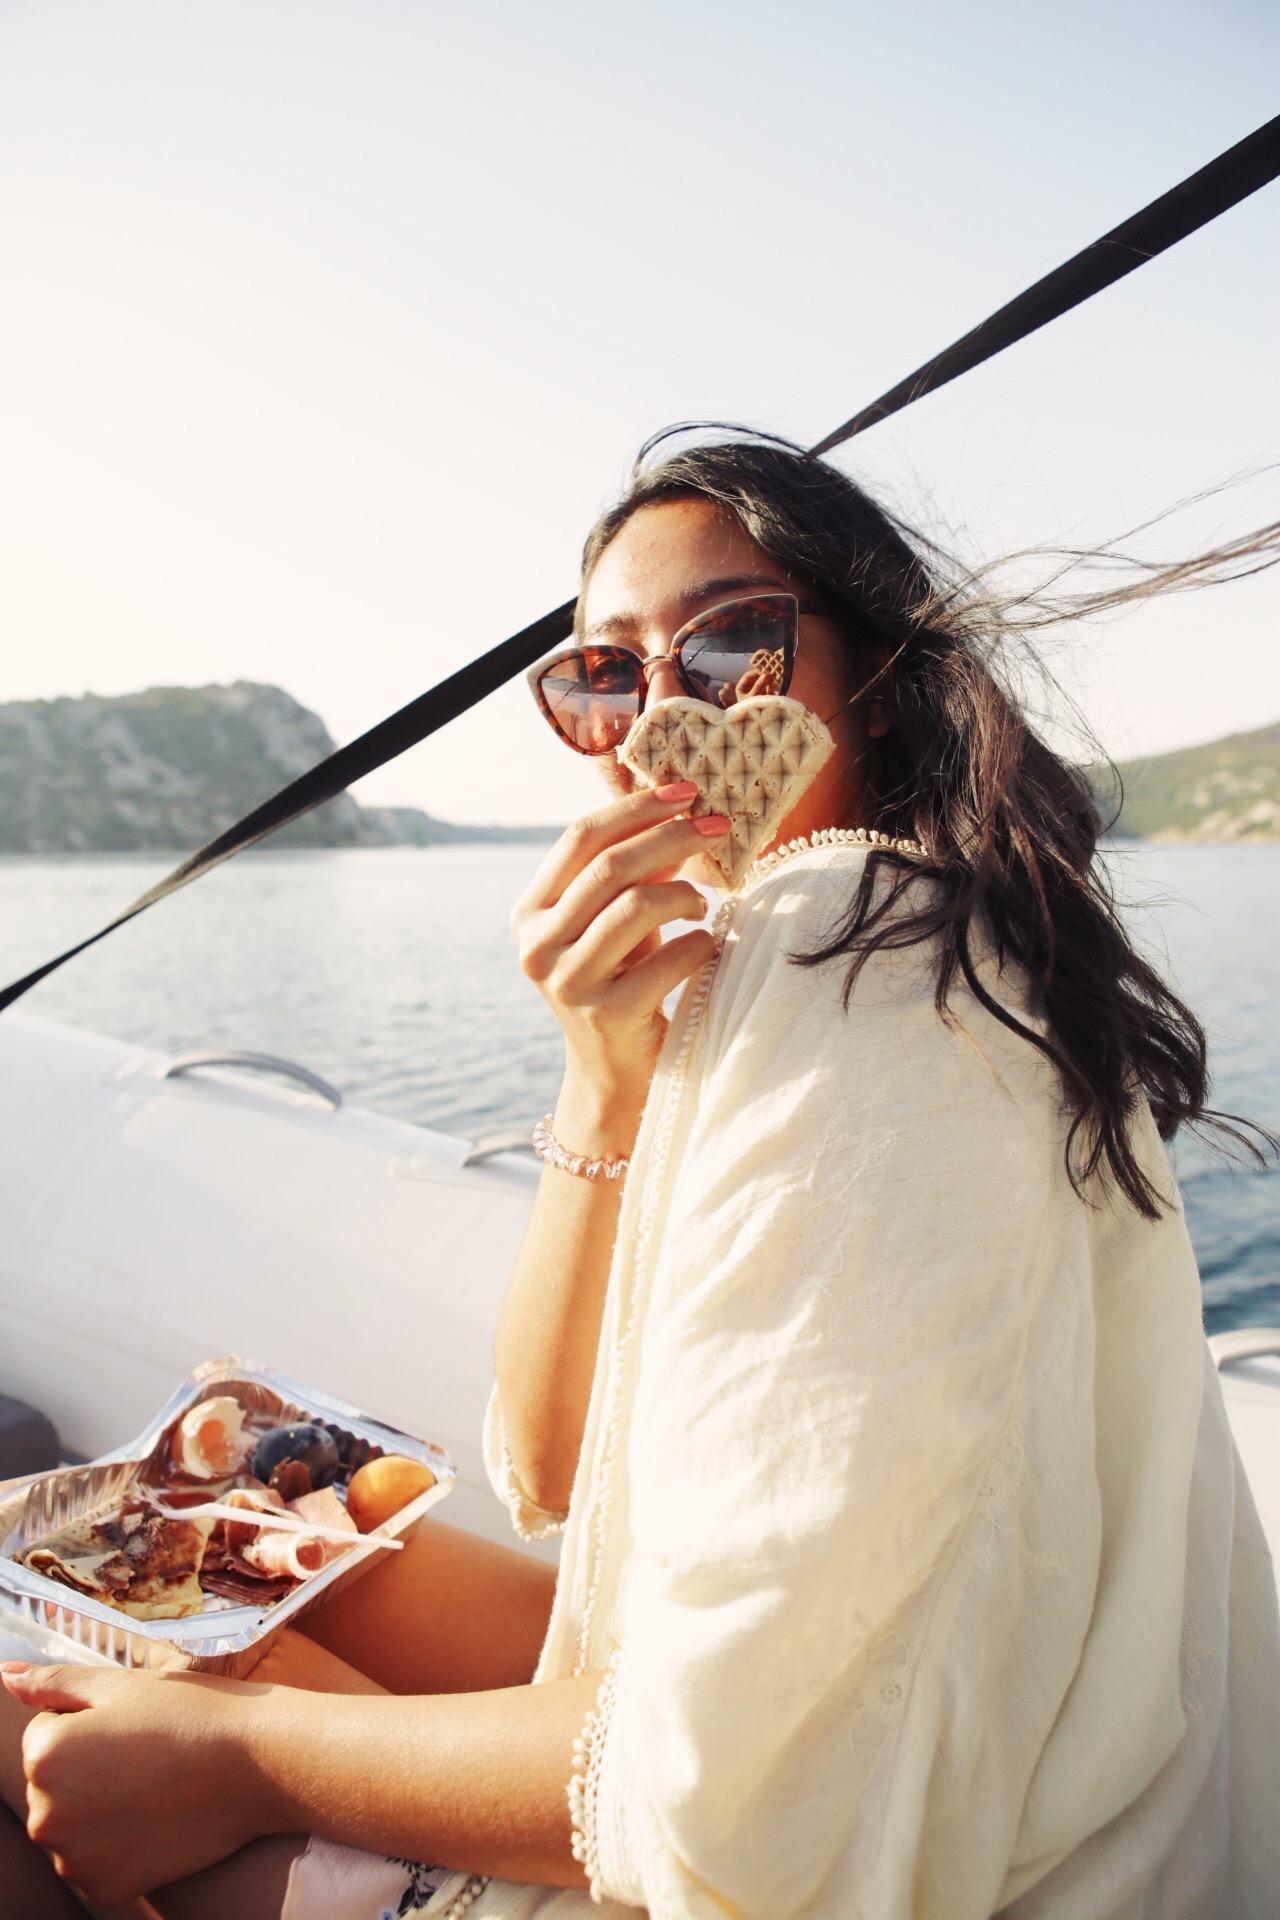 The Admiral Zaton - Heart Waffles - Takeaway Breakfast before Krka - Sibenik, Croatia - illumelation